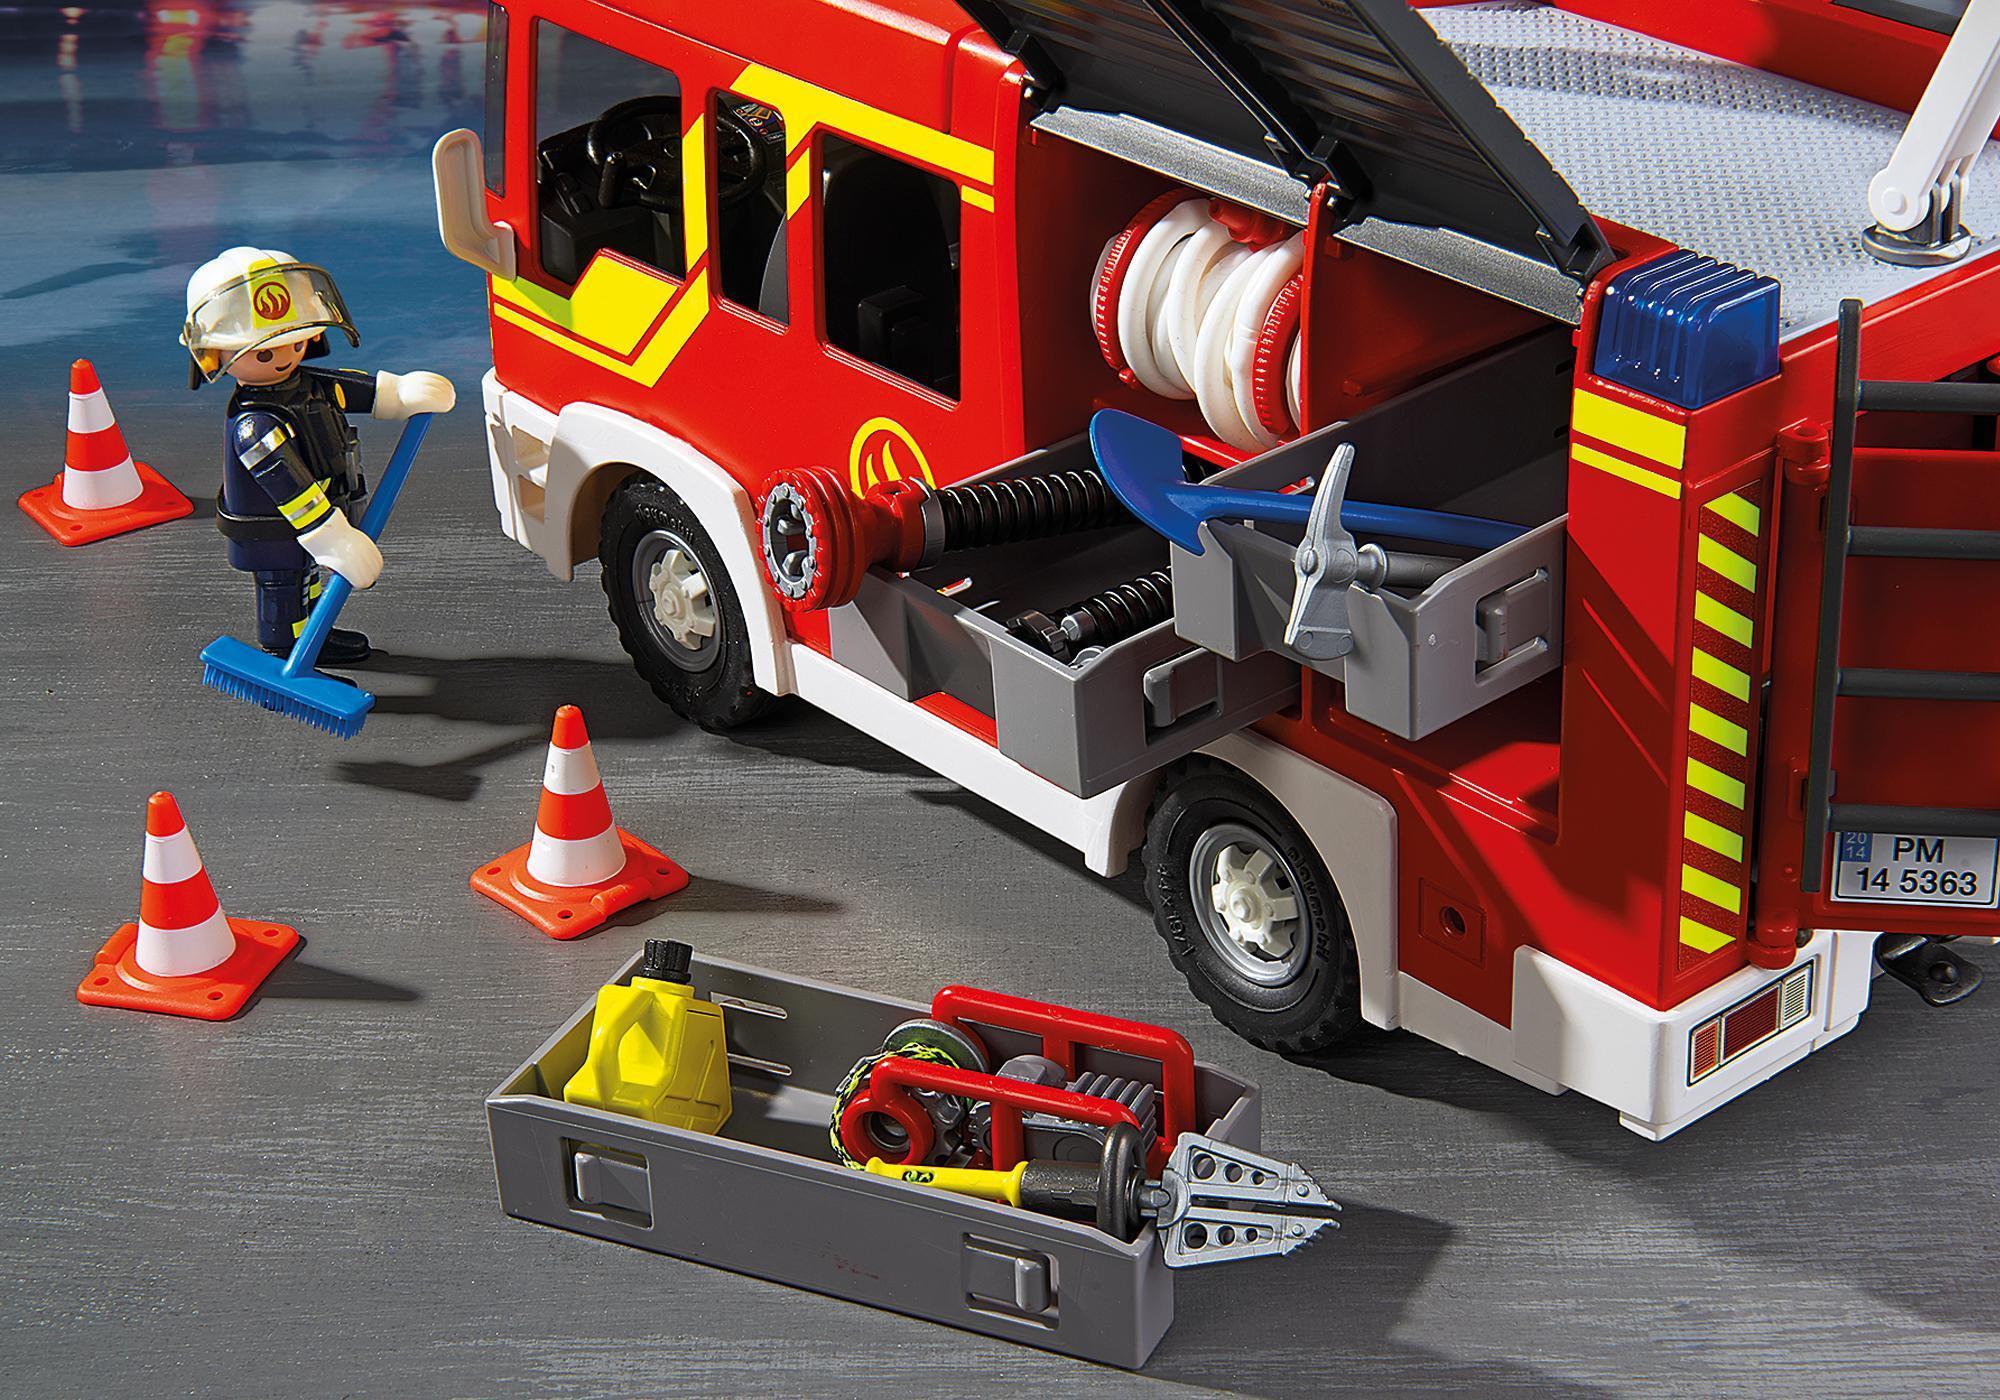 http://media.playmobil.com/i/playmobil/5363_product_extra3